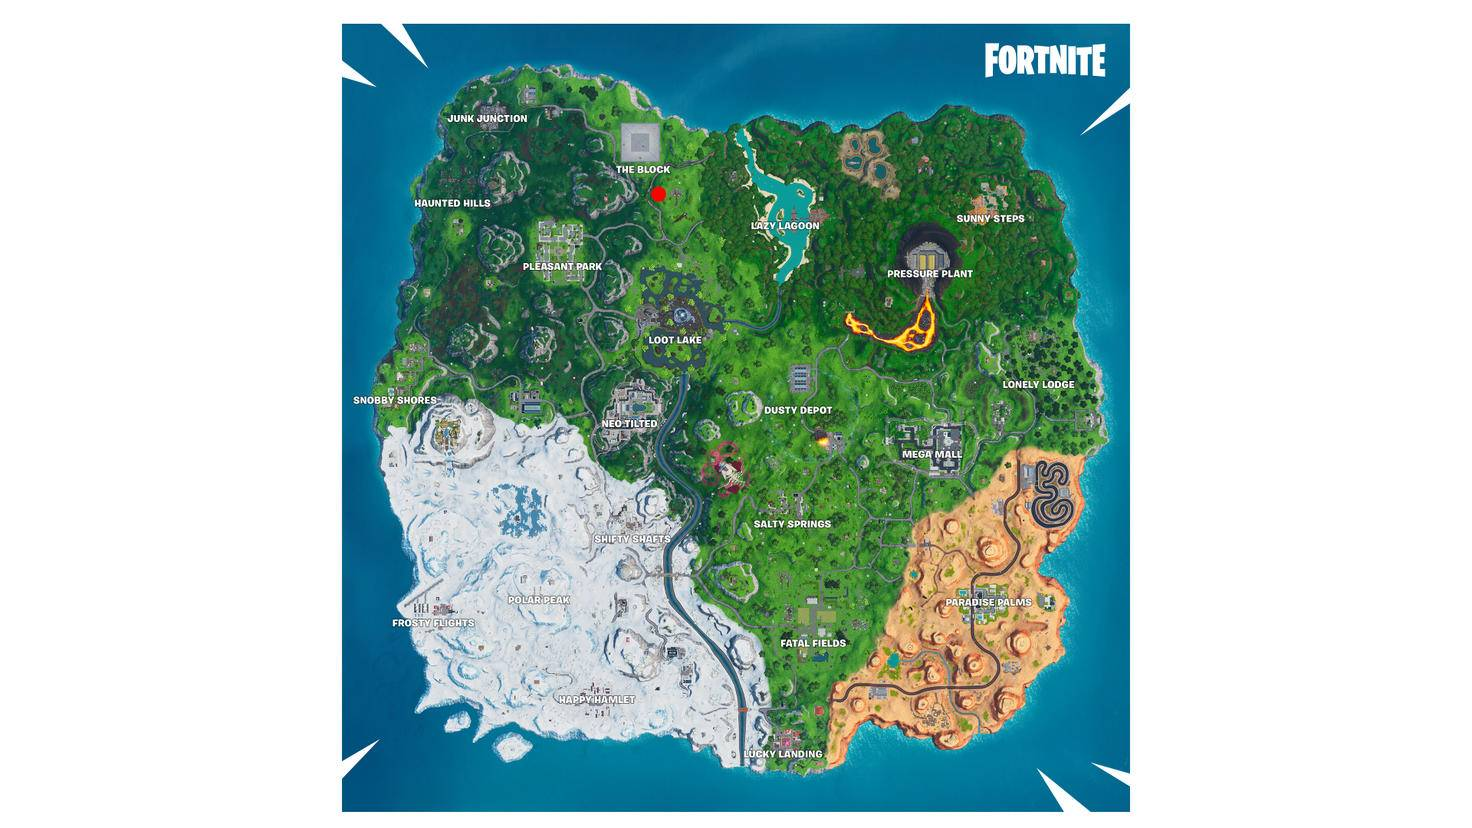 fortnite-map-season-10-geheimer-battlestar-woche-1